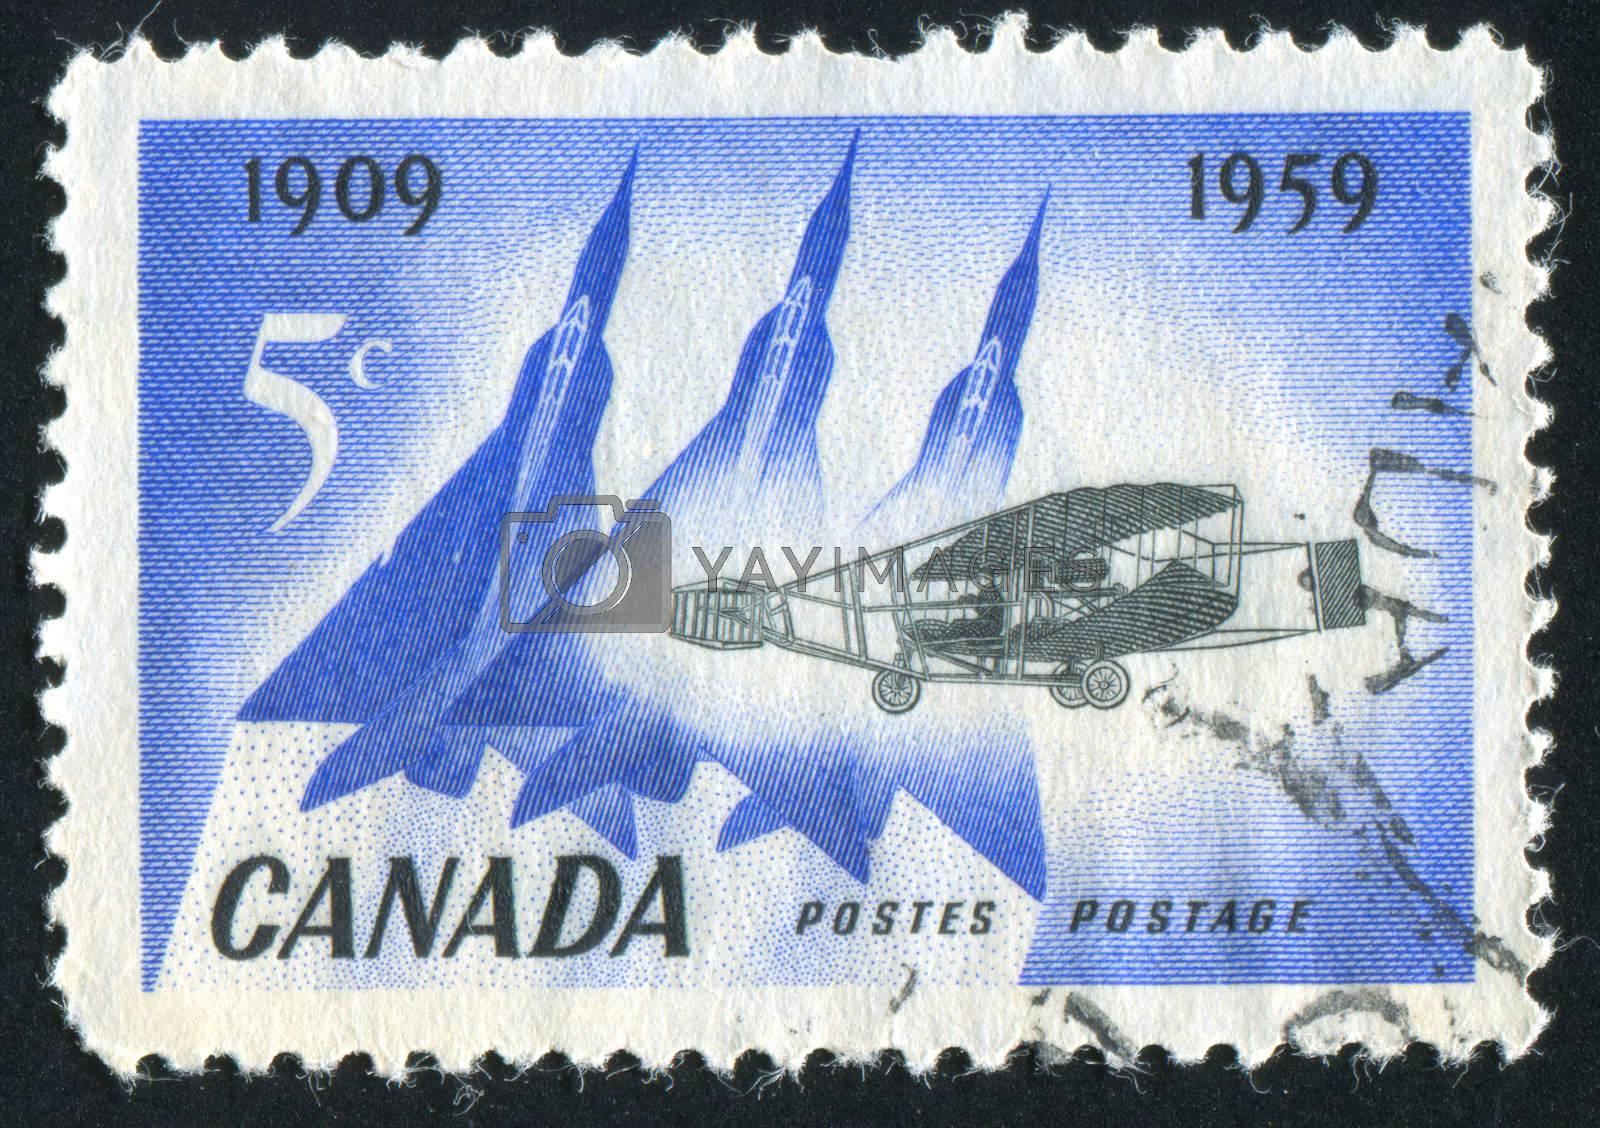 CANADA - CIRCA 1959: stamp printed by Canada, shows aeroplane, circa 1959